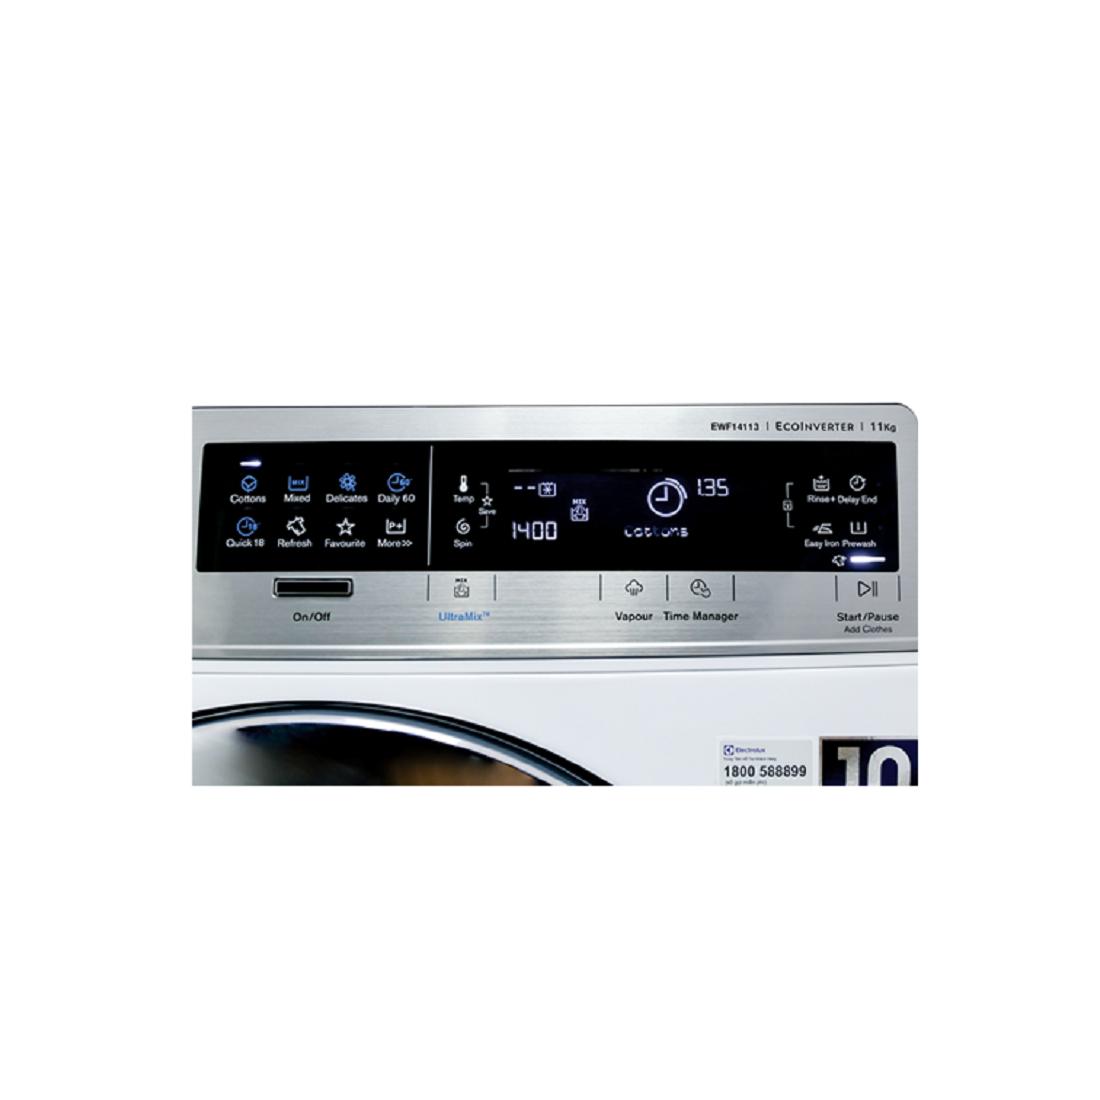 Máy Giặt Electrolux Inverter 11 Kg EWF14113-Thế giới đồ gia